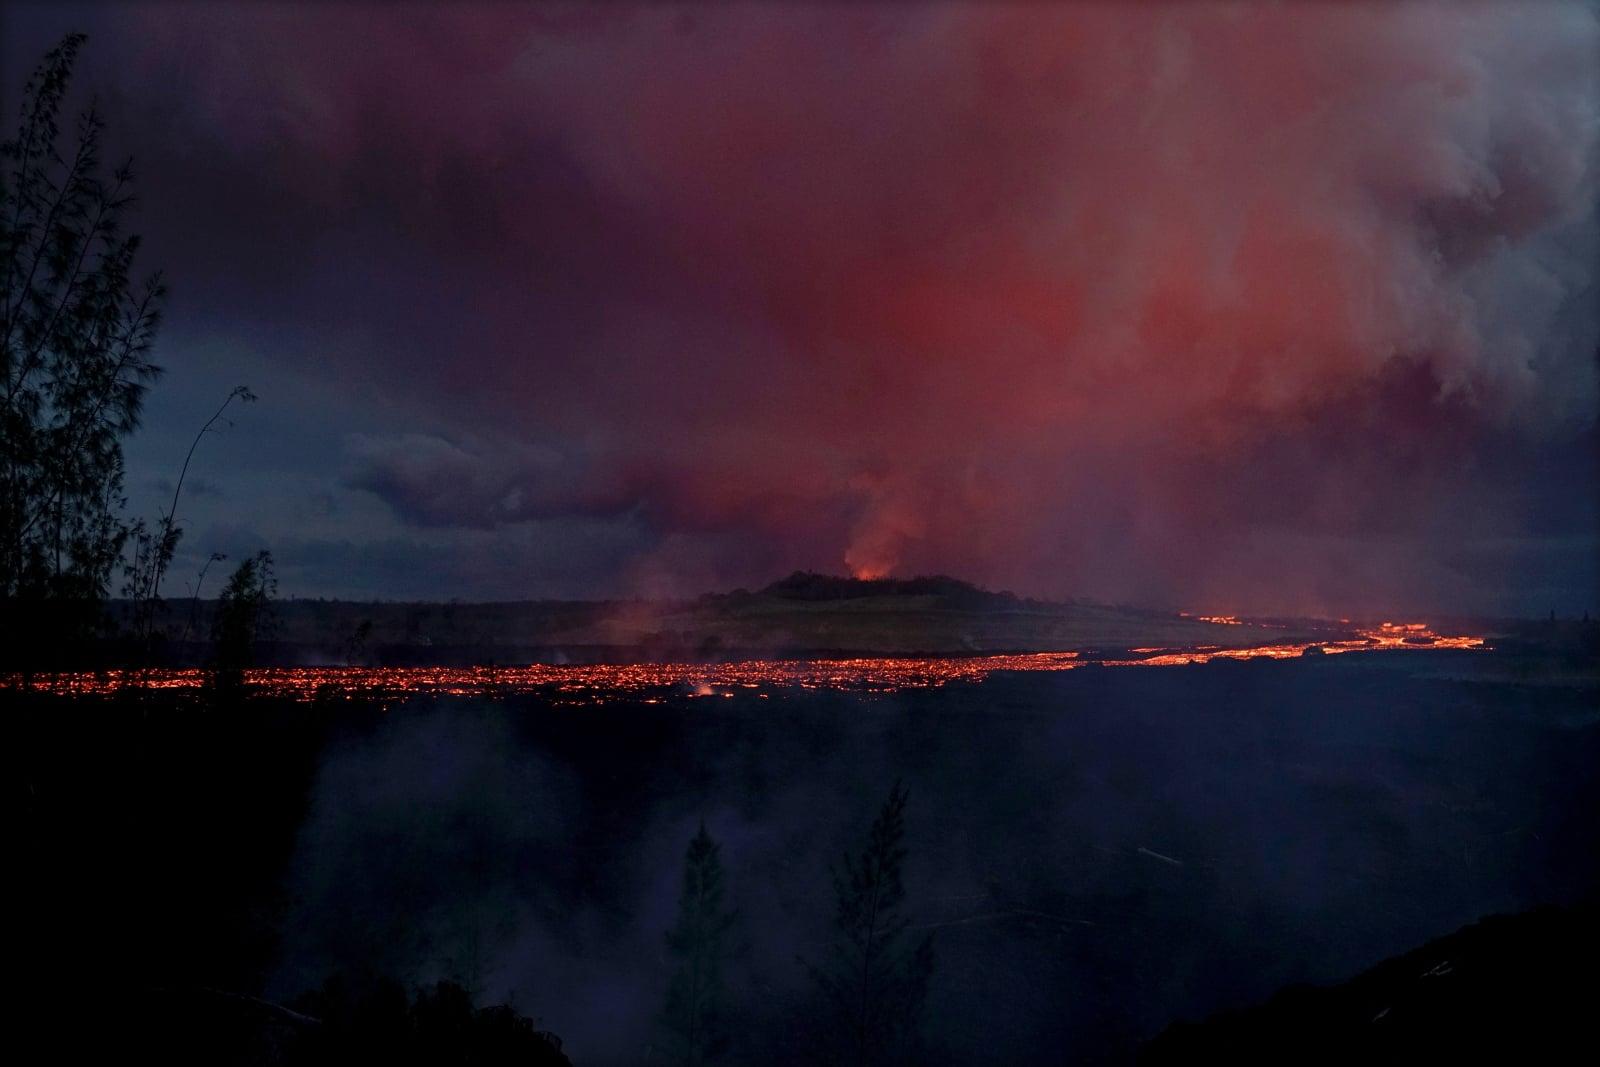 Hawajski wulkan fot. EPA/TECH. SGT. ANDREW JACKSON/US AIR Dostawca: PAP/EPA.